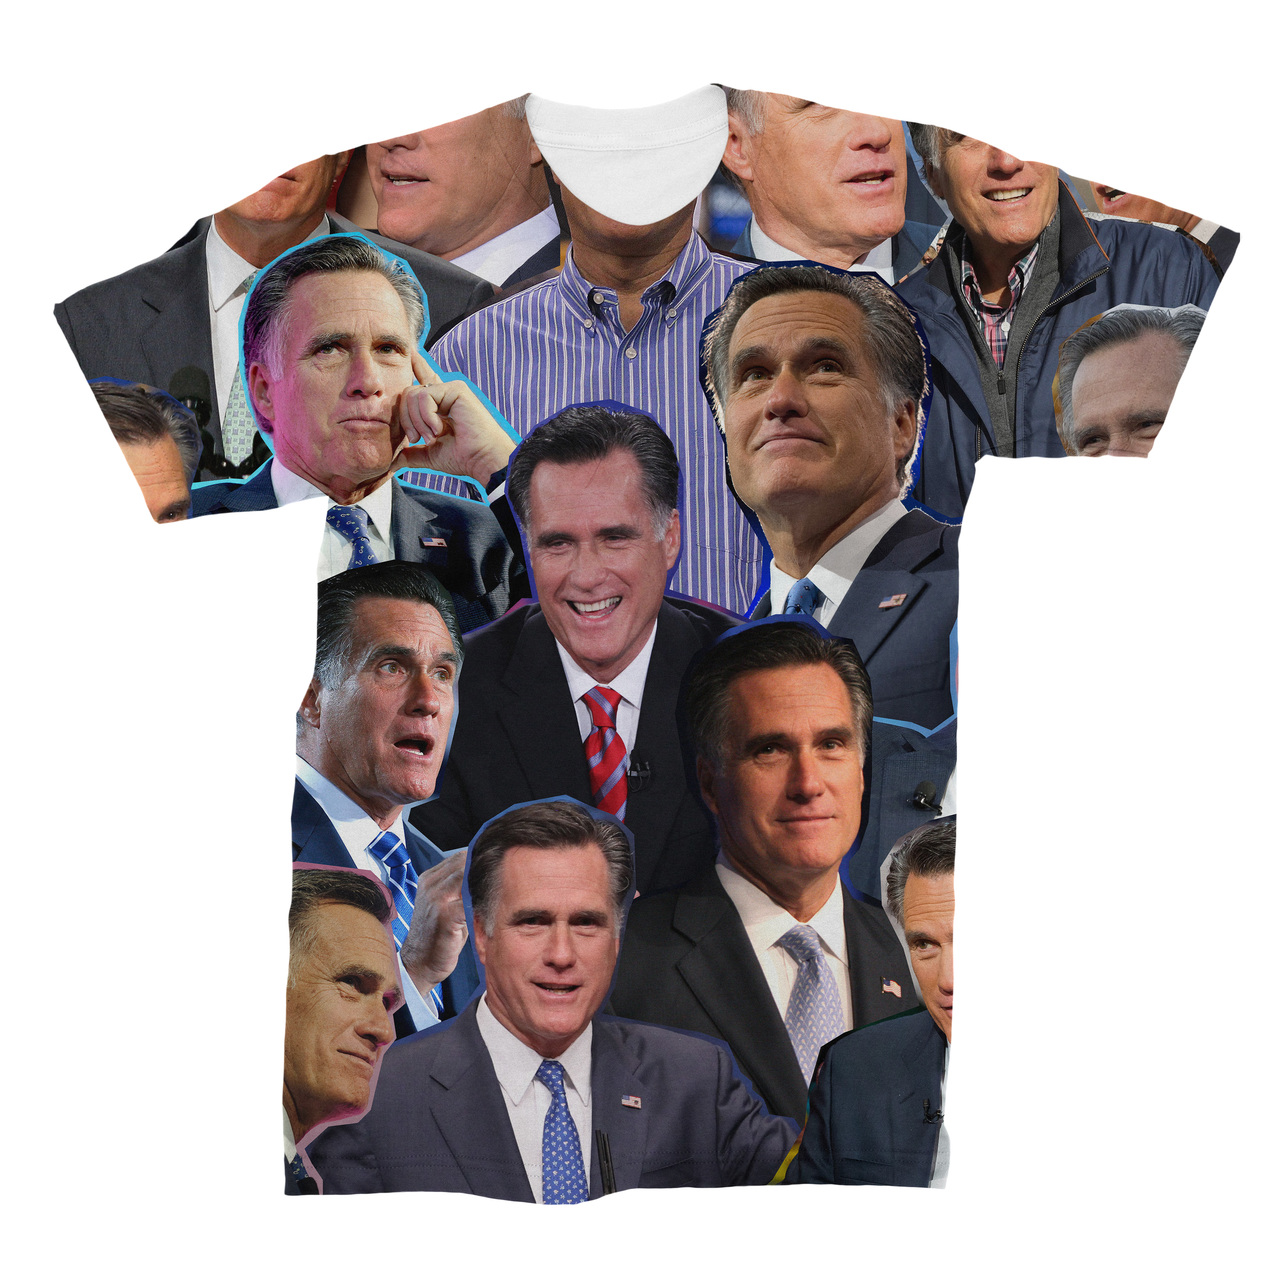 b84537214a1f1e Mitt Romney Photo Collage T-Shirt - Subliworks